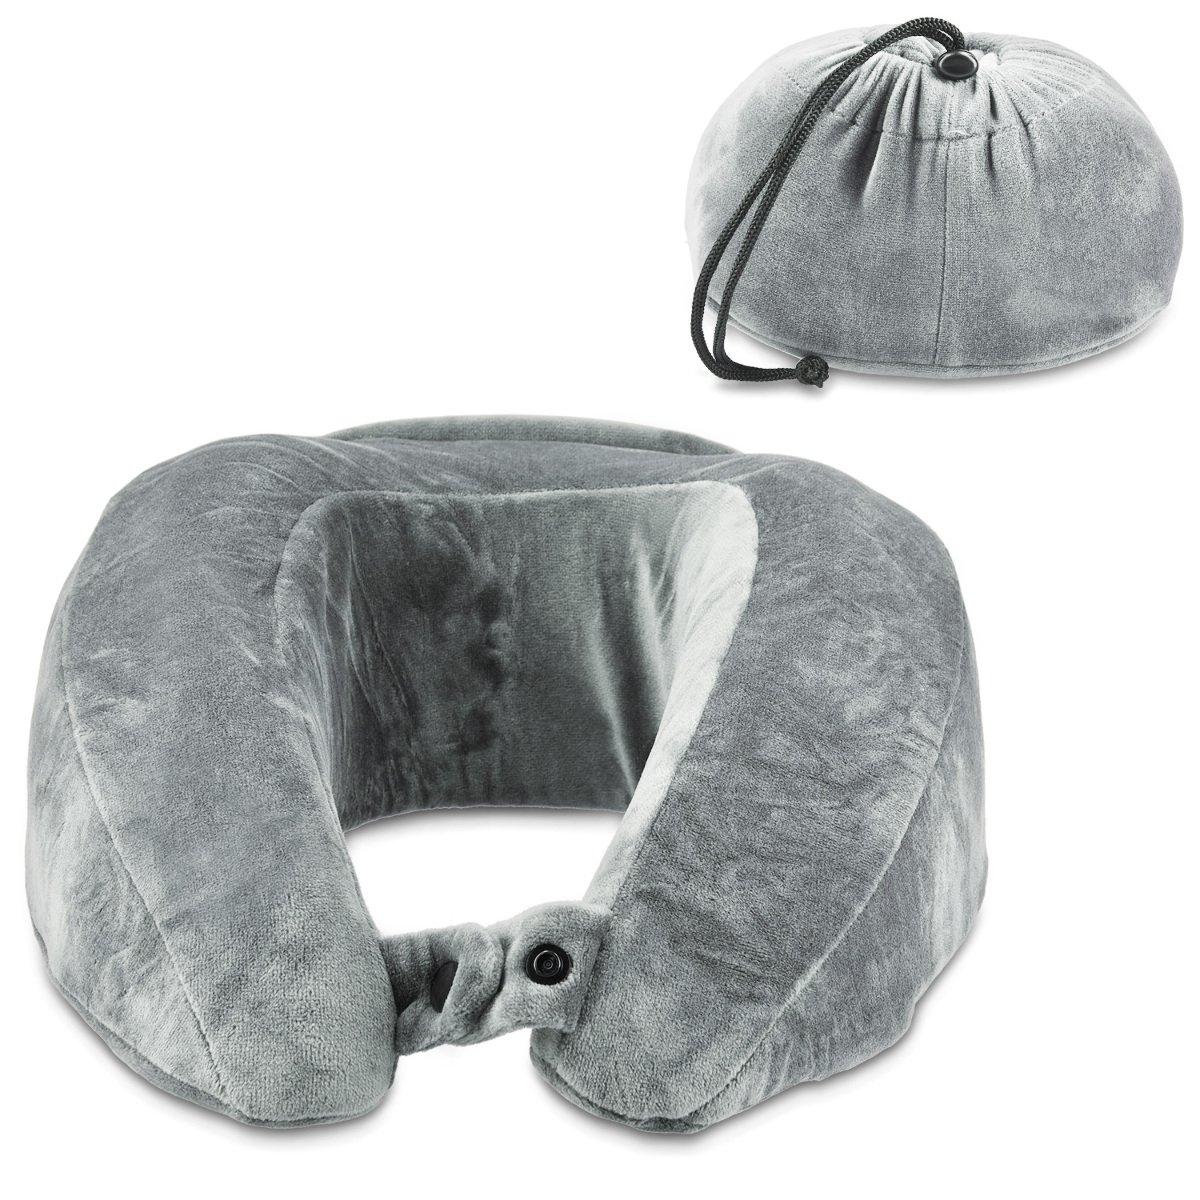 Navaris almohada de viaje con bolso integrado almohada cervical de espuma viscoelástica